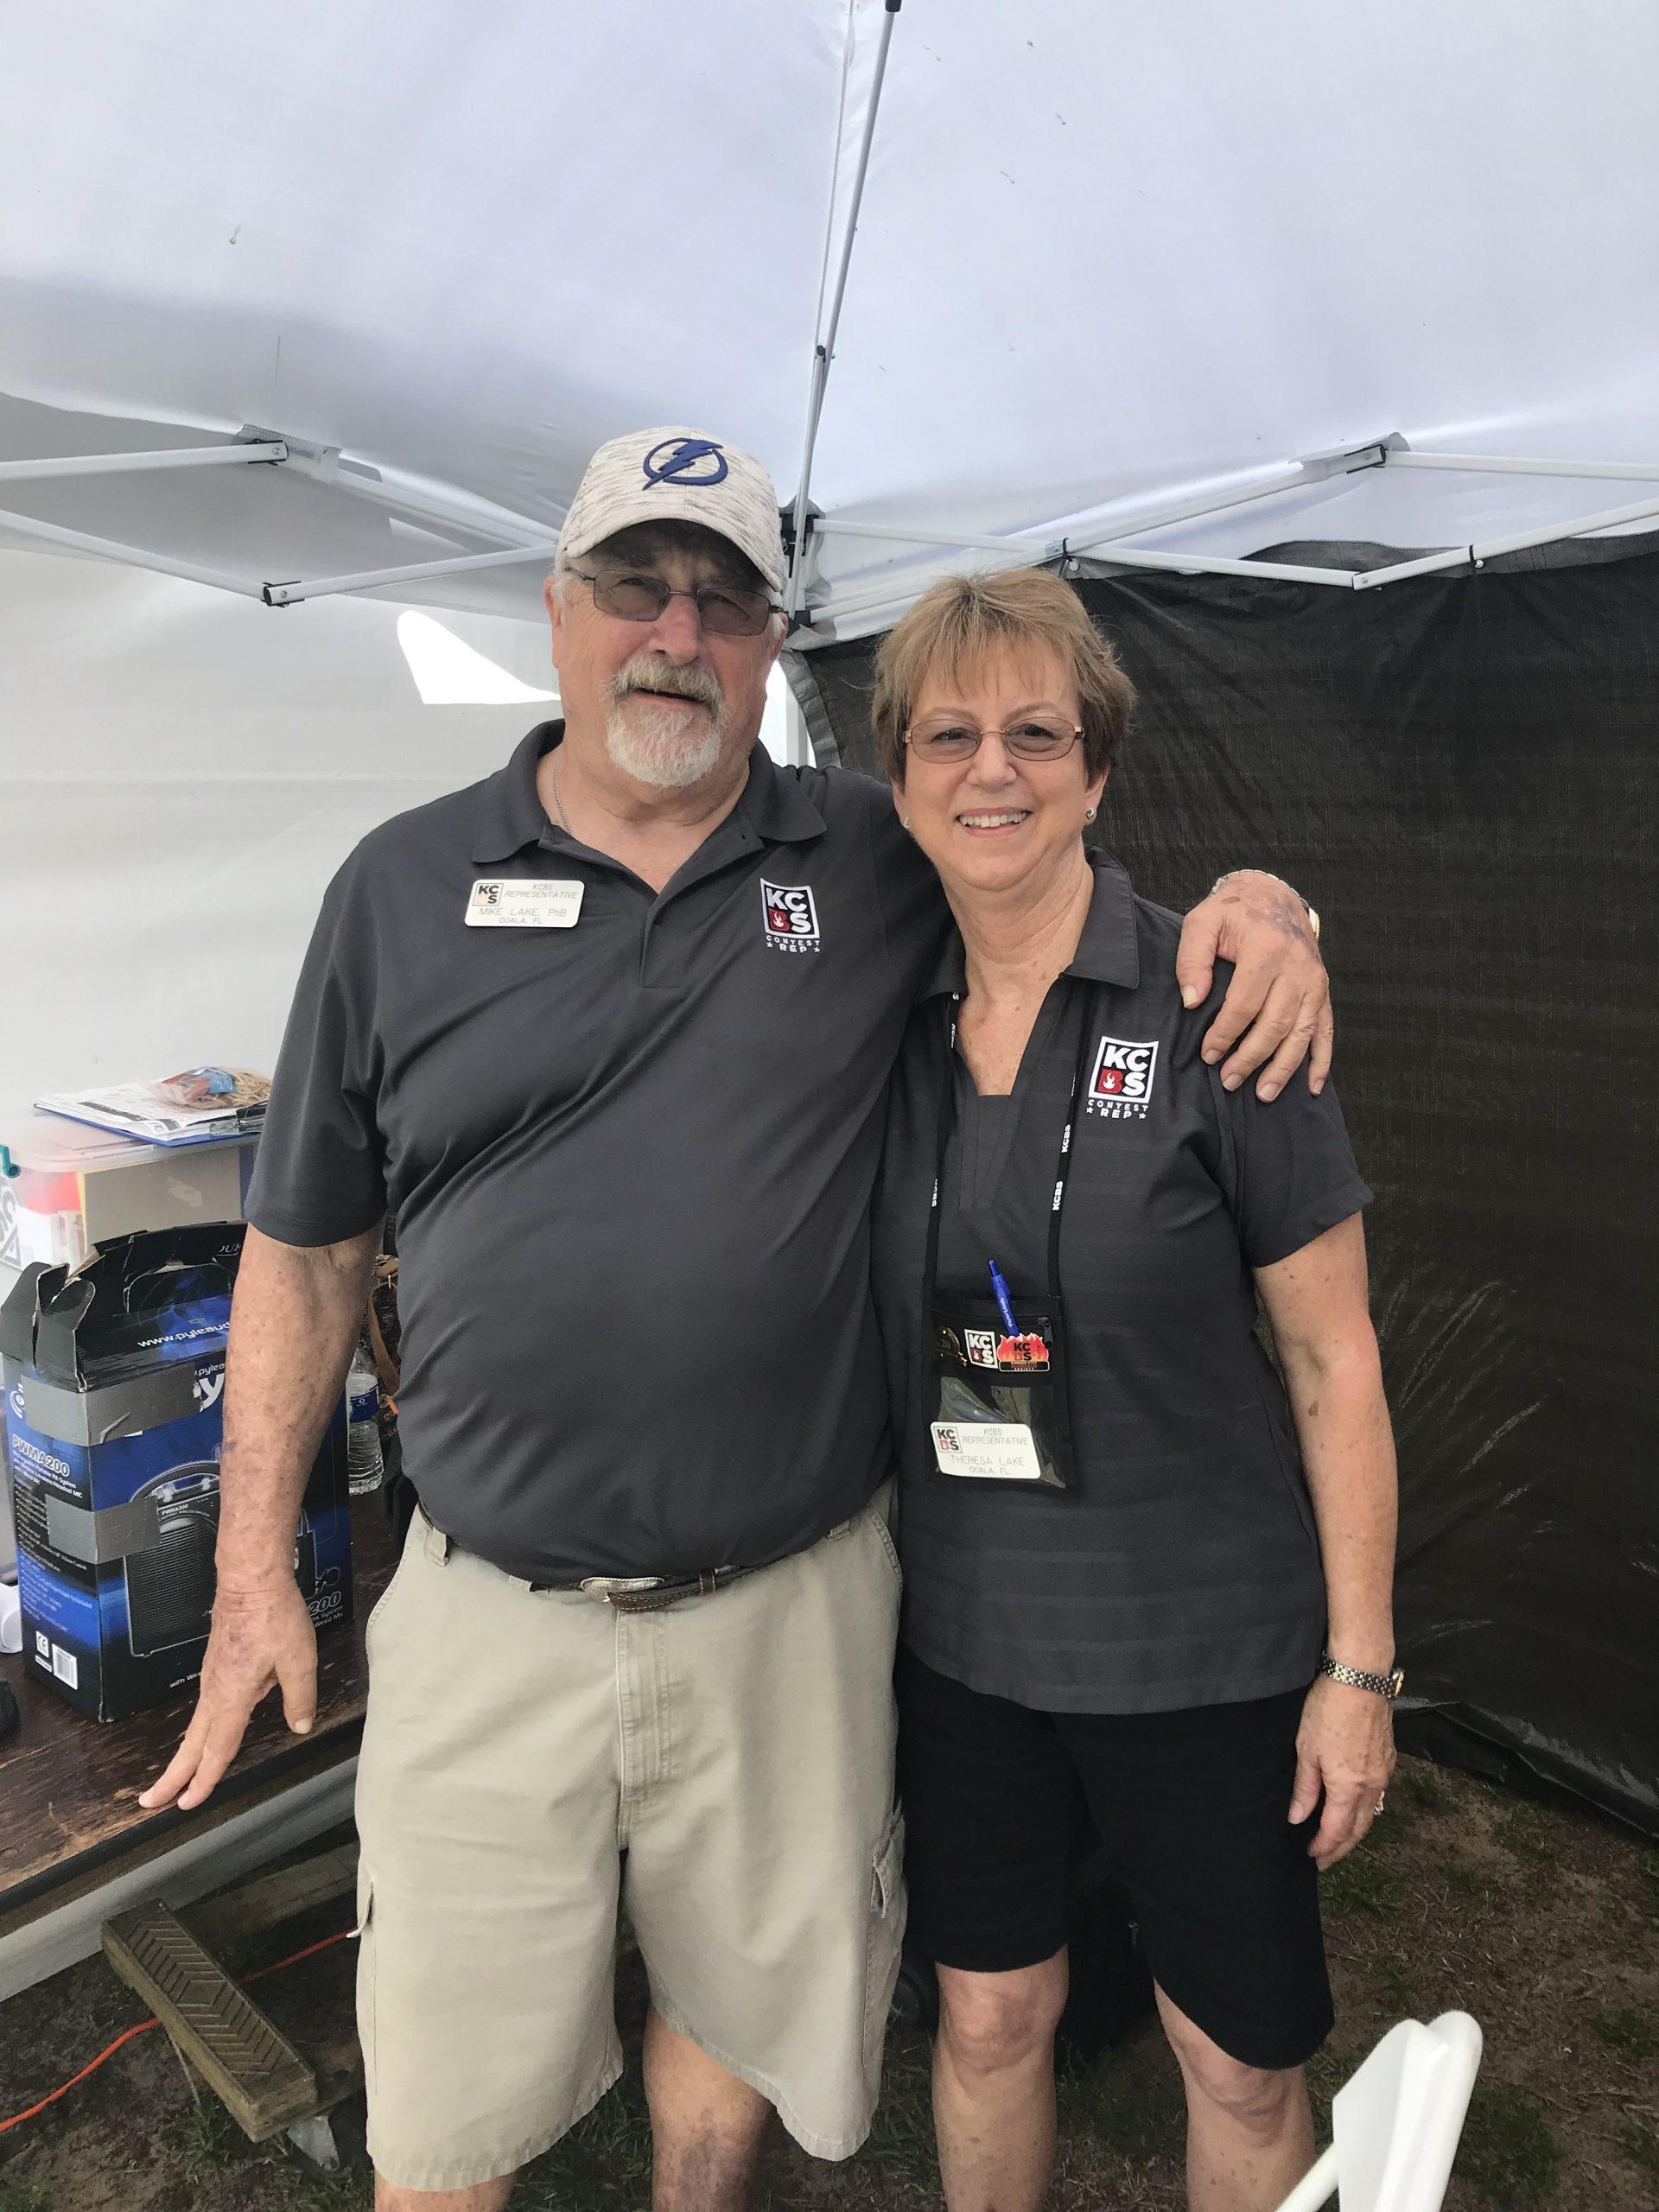 Mike and Theresa Lake